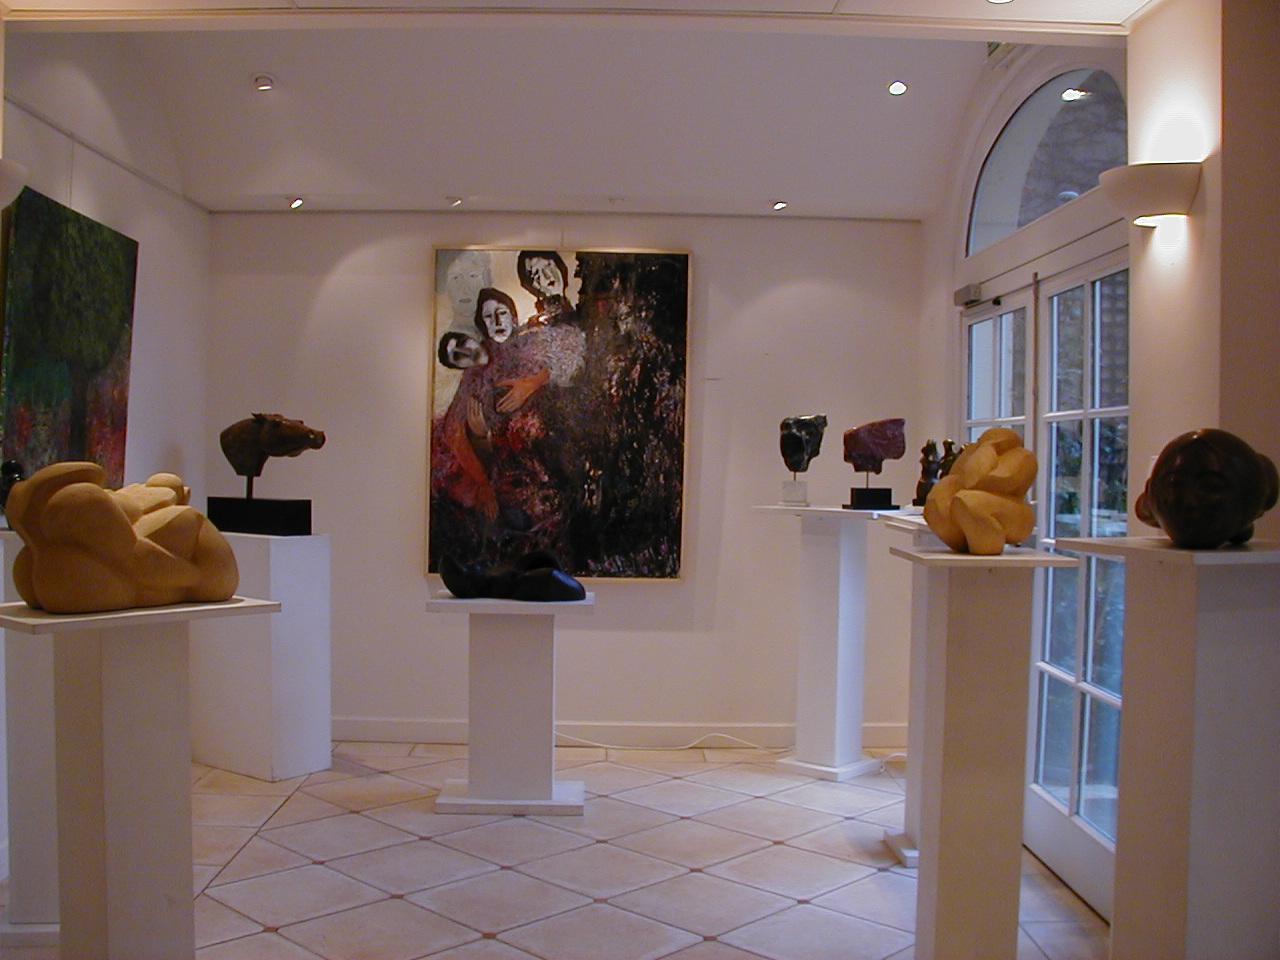 Photo: Le Café des Artistes et des Pêcheurs 併設の画廊  『シベールの日曜日』 http://goo.gl/QY1gi(参考)